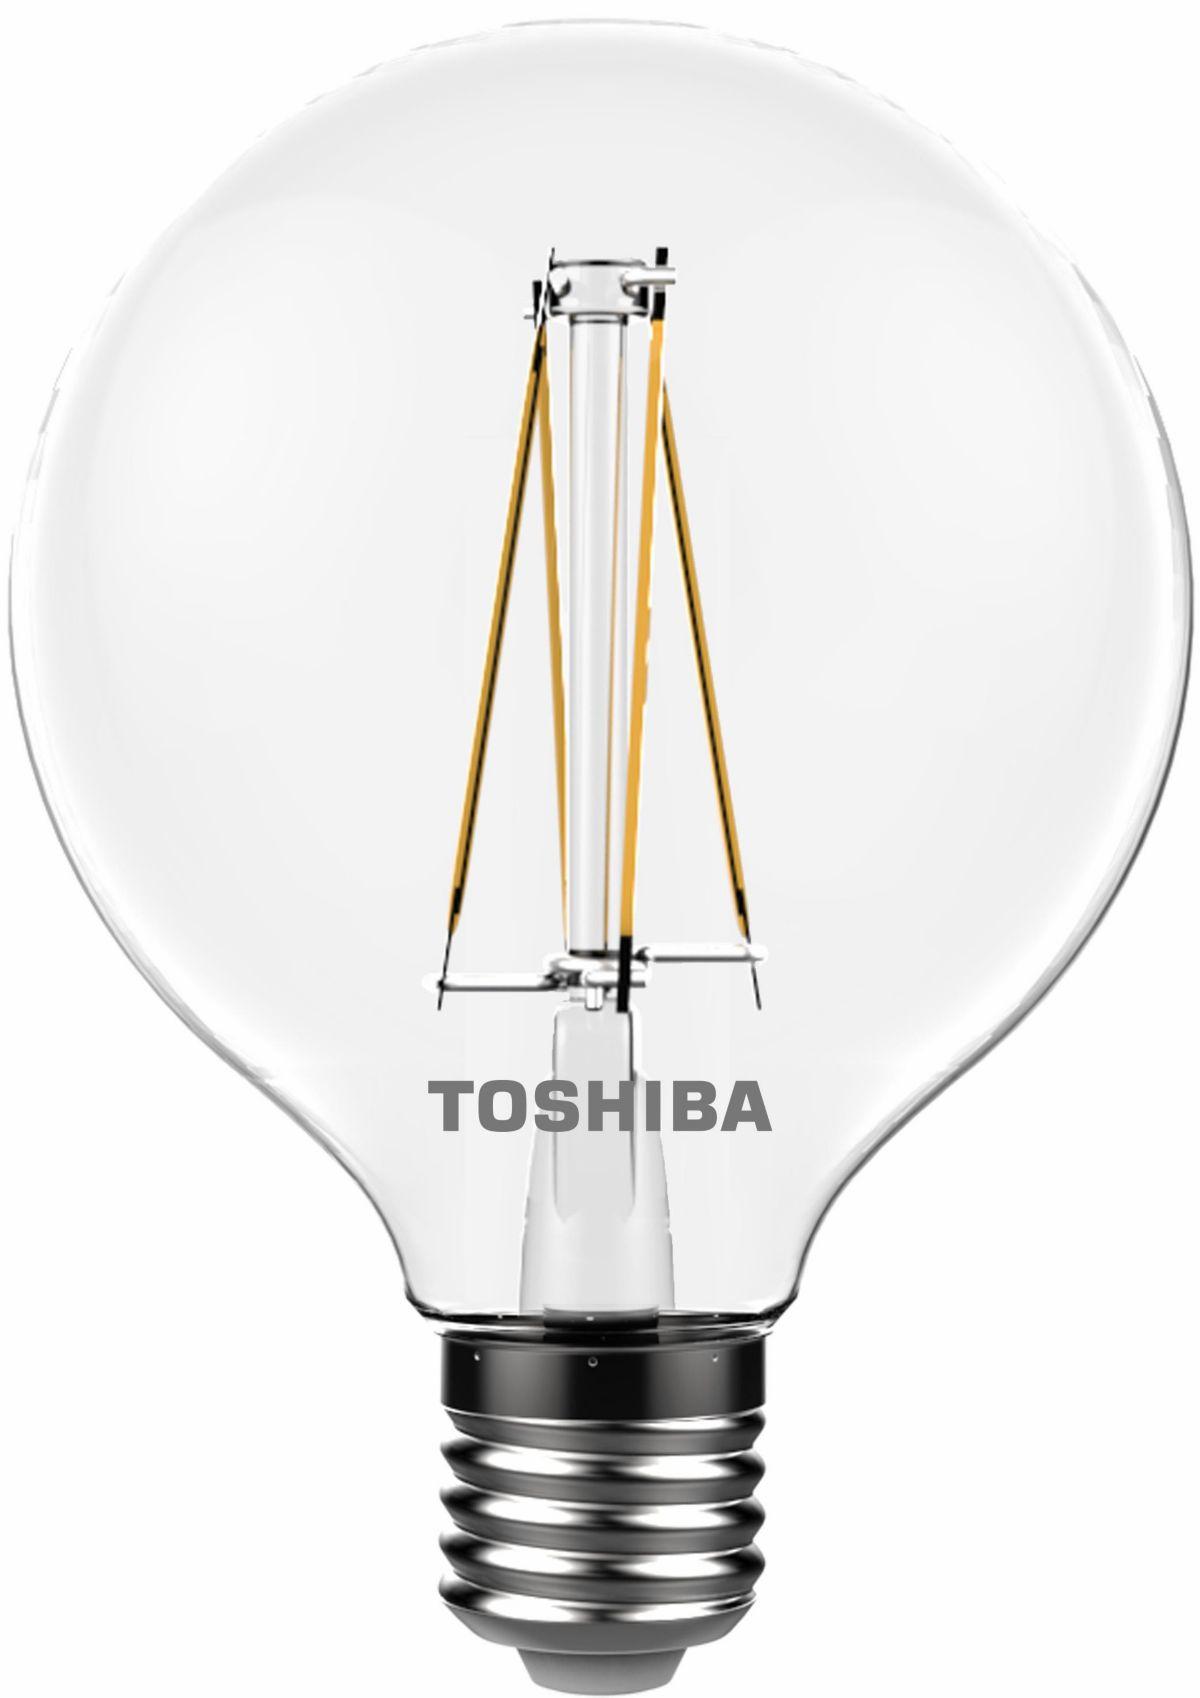 Toshiba LED Leuchtmittel, 2er Set, Filament, »K...